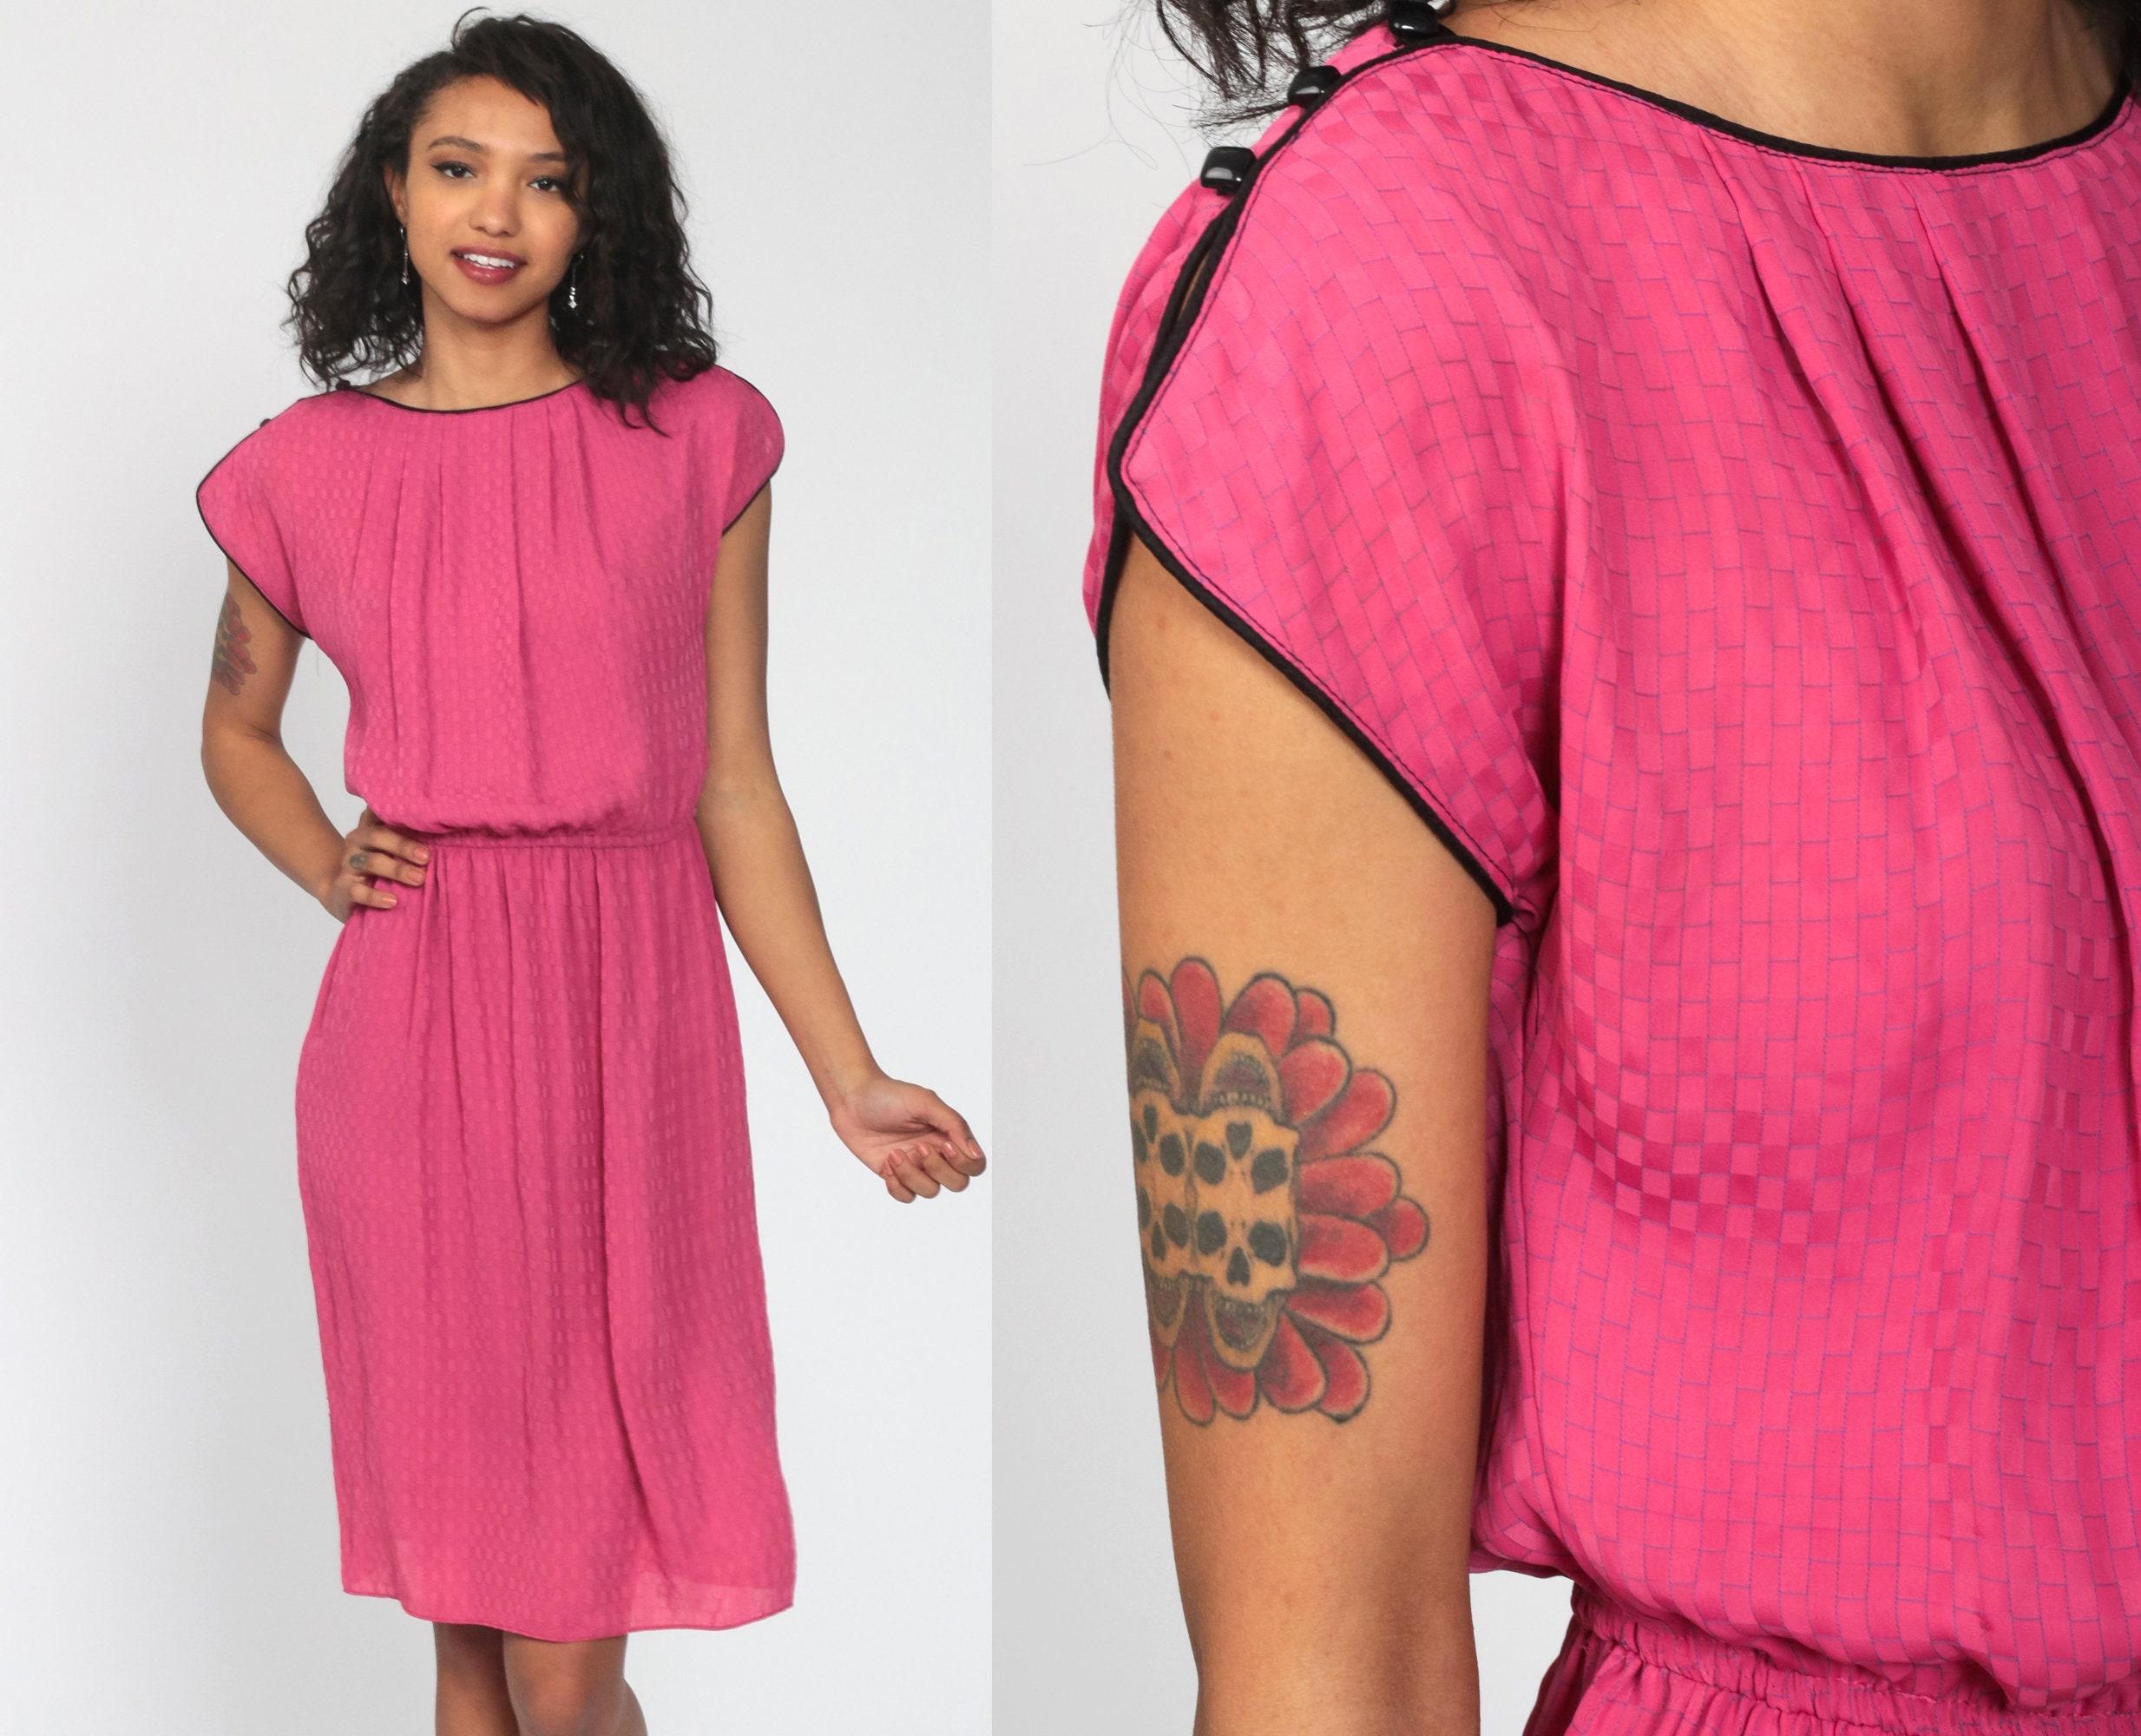 70s Midi Dress Plain Pink Split Cap Sleeve Ringer Dress 1970s High Elastic Waist Blouson Secretary Retro Vintage 80s Day Small s